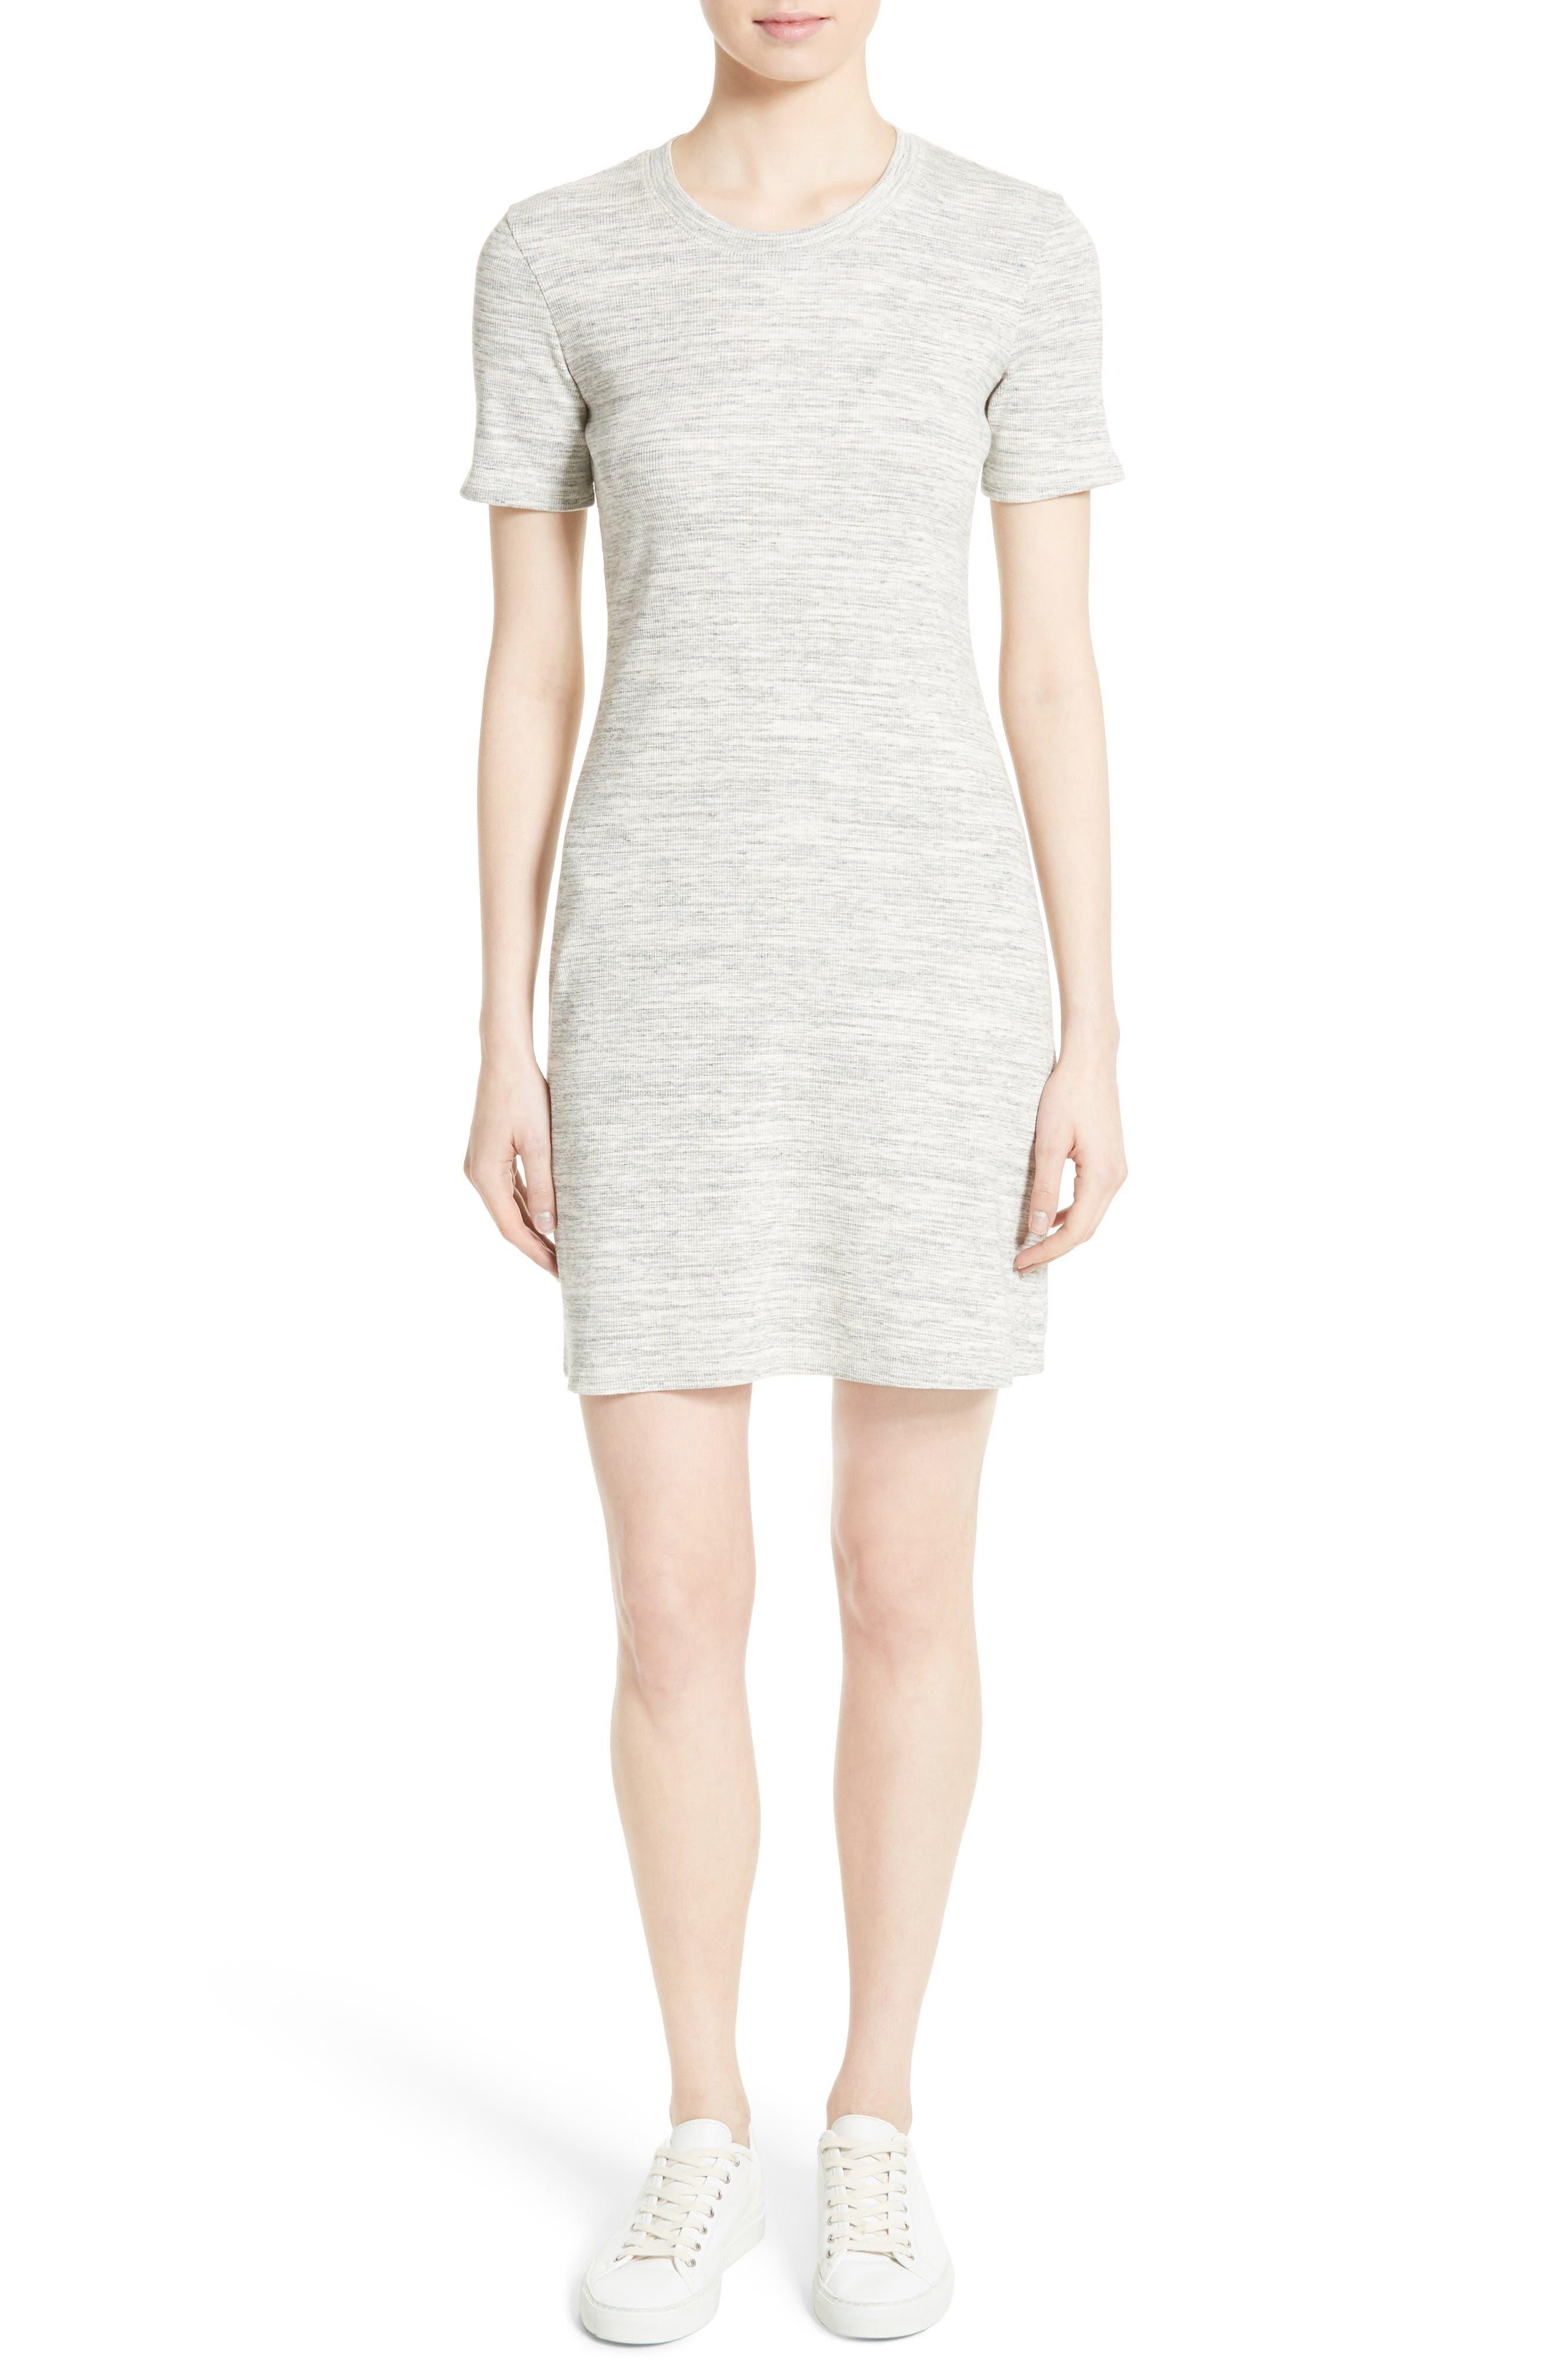 Main Image - Theory Cherry B3 Sterling Rib Knit T-Shirt Dress